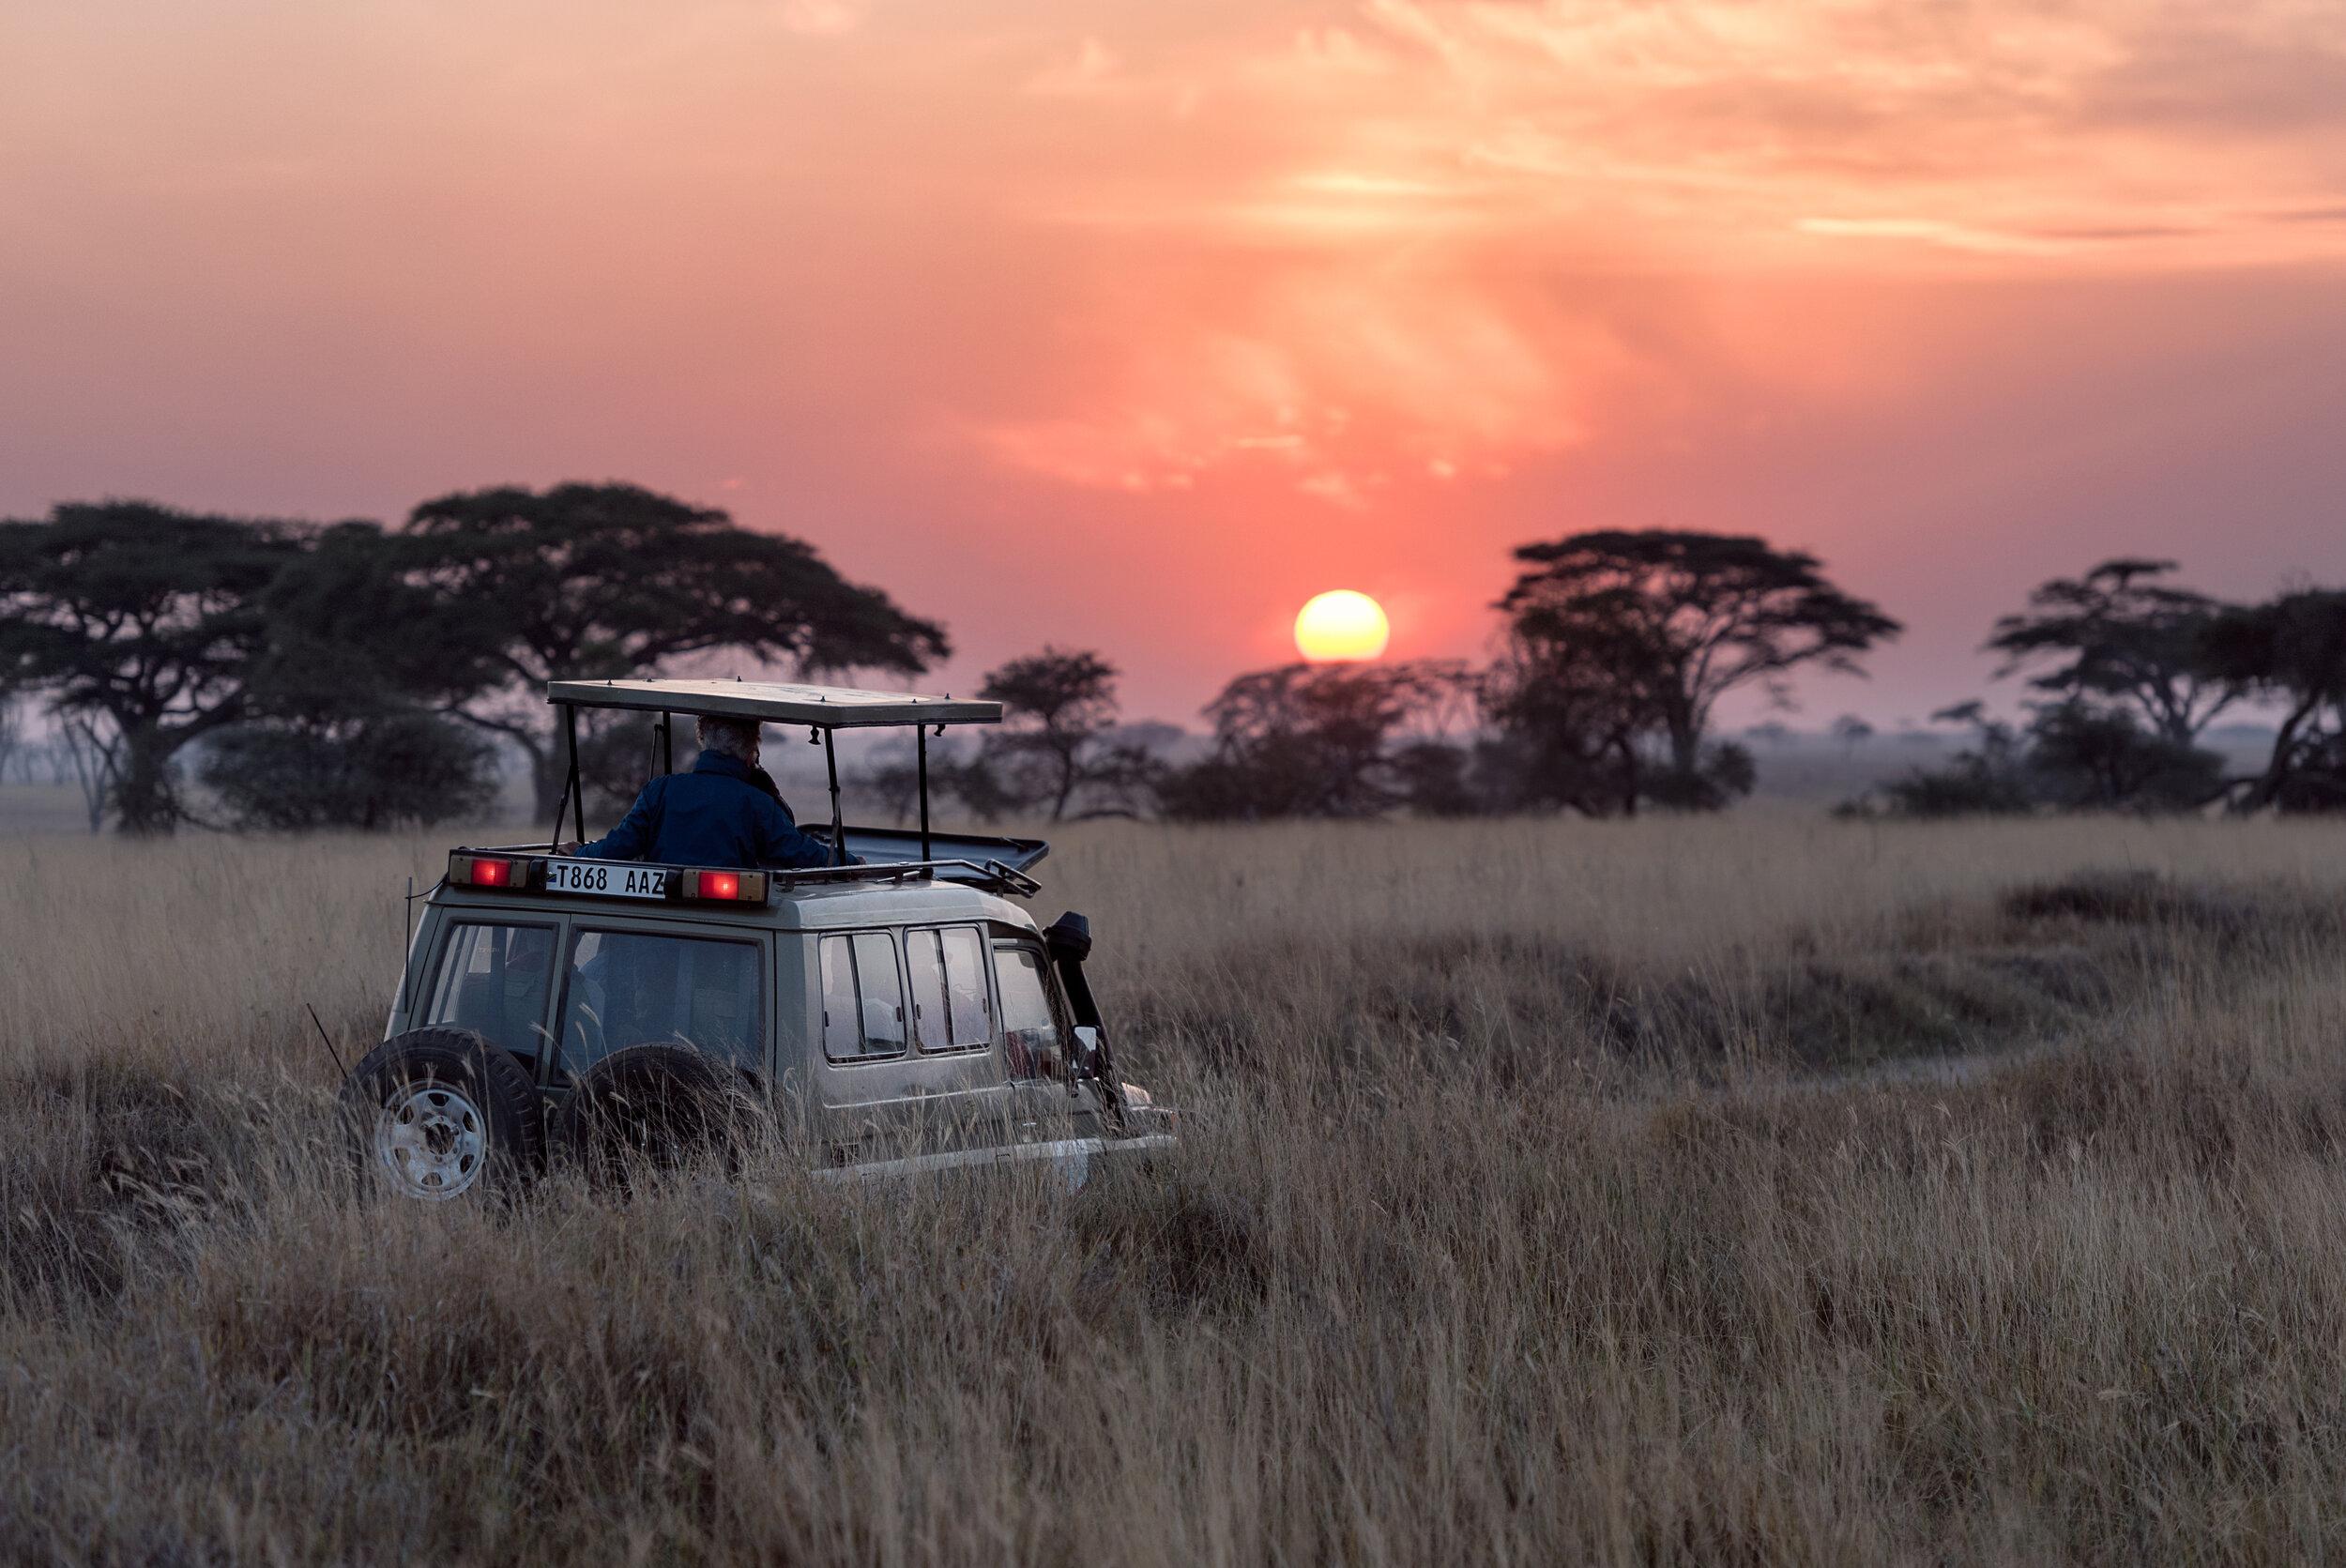 2019/2020: TANZANIA- FACES OF NATURE -